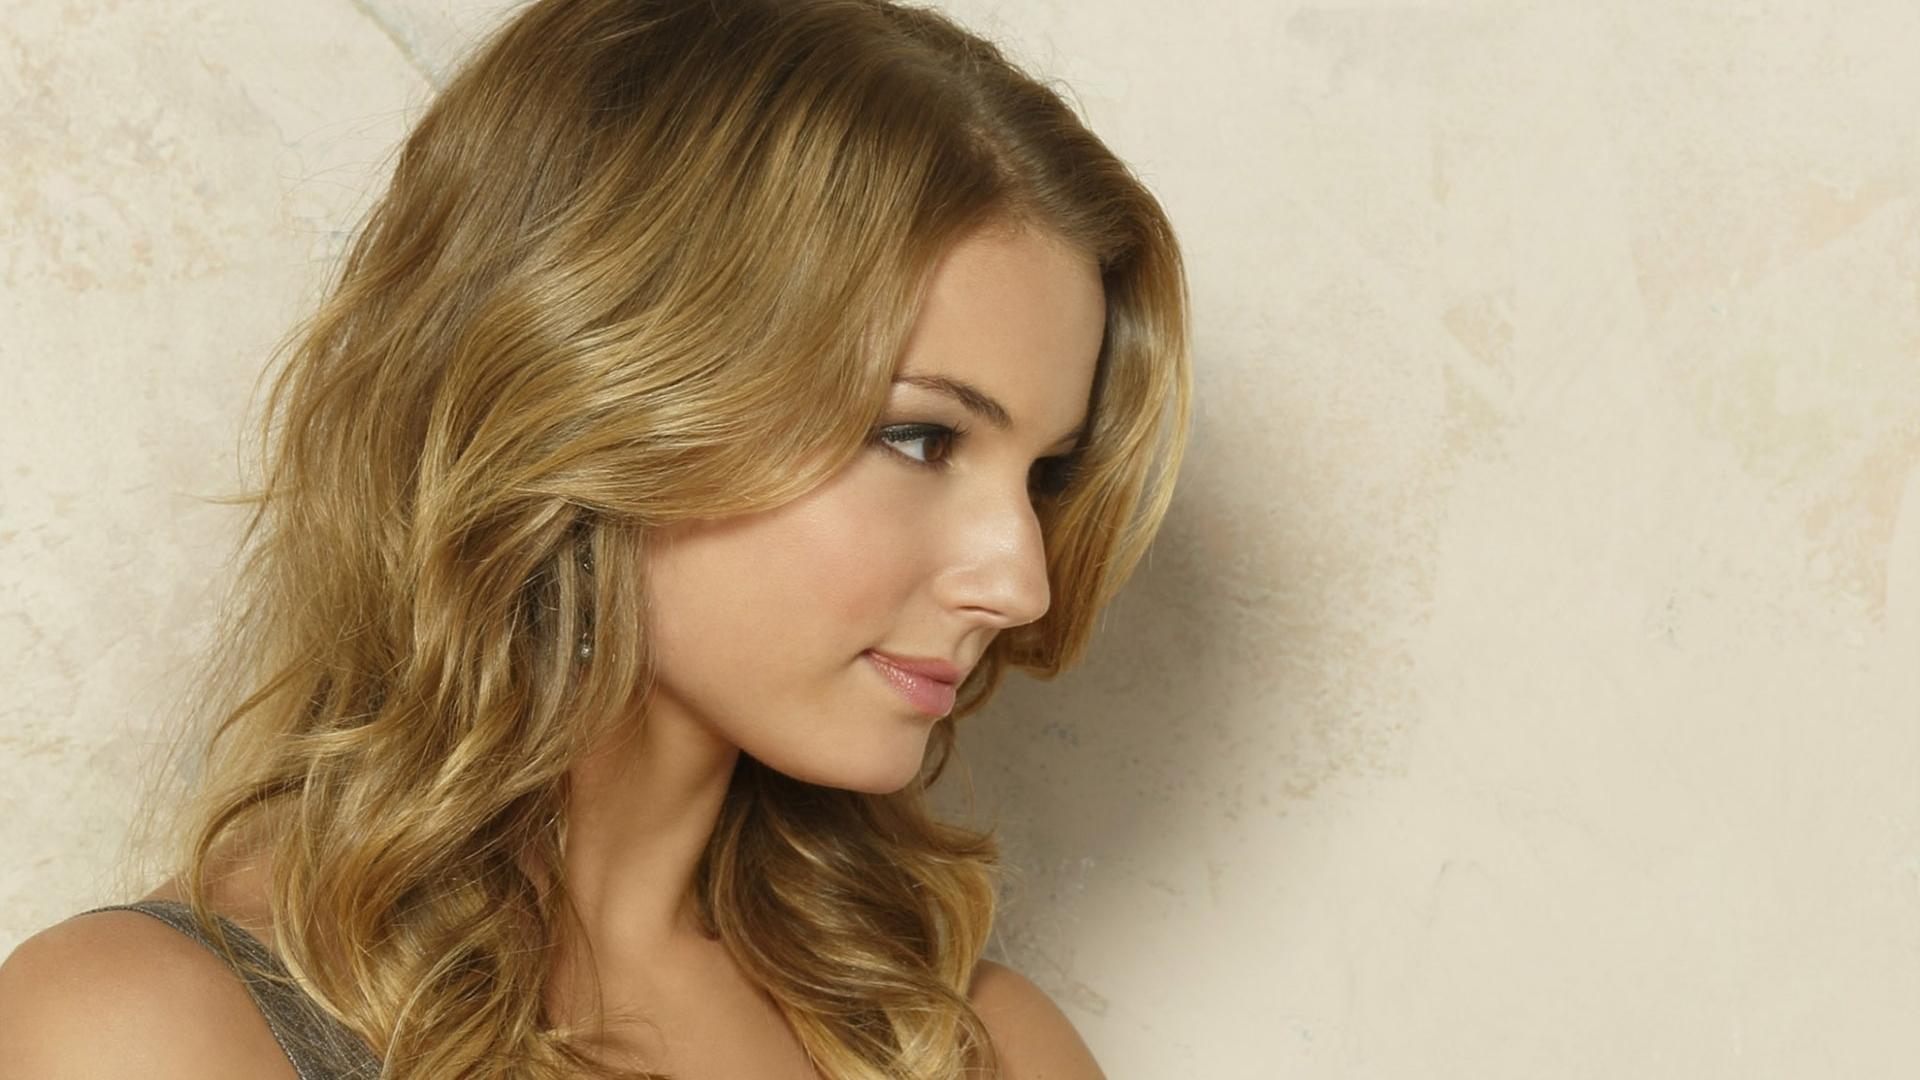 Wallpaper Face Model Blonde Long Hair Profile Actress Nose